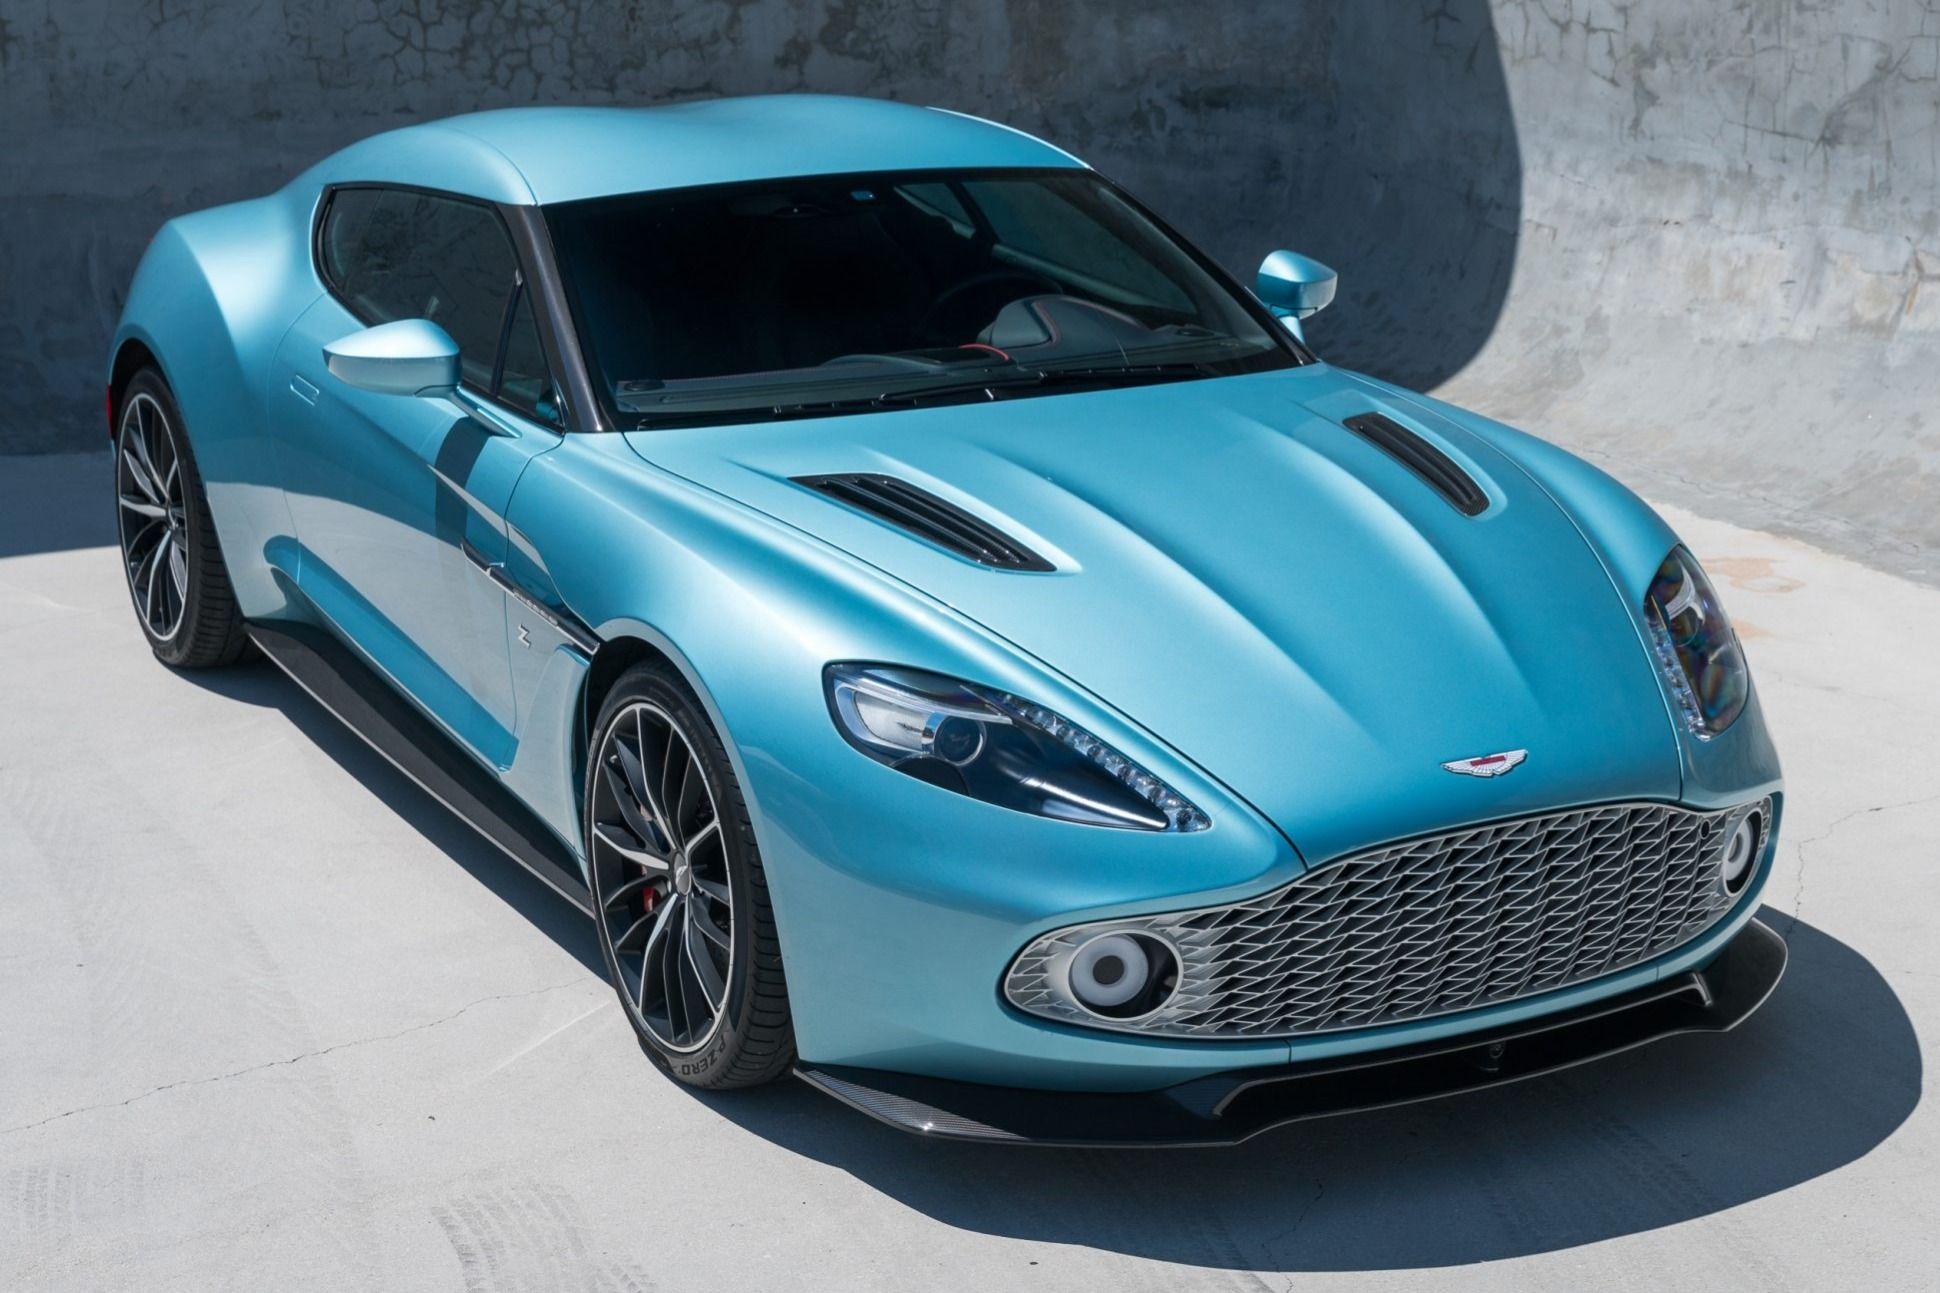 2019 Aston Martin Vanquish Zagato Shooting Brake Vin Scfnmcuzxkgj54490 Classic Com